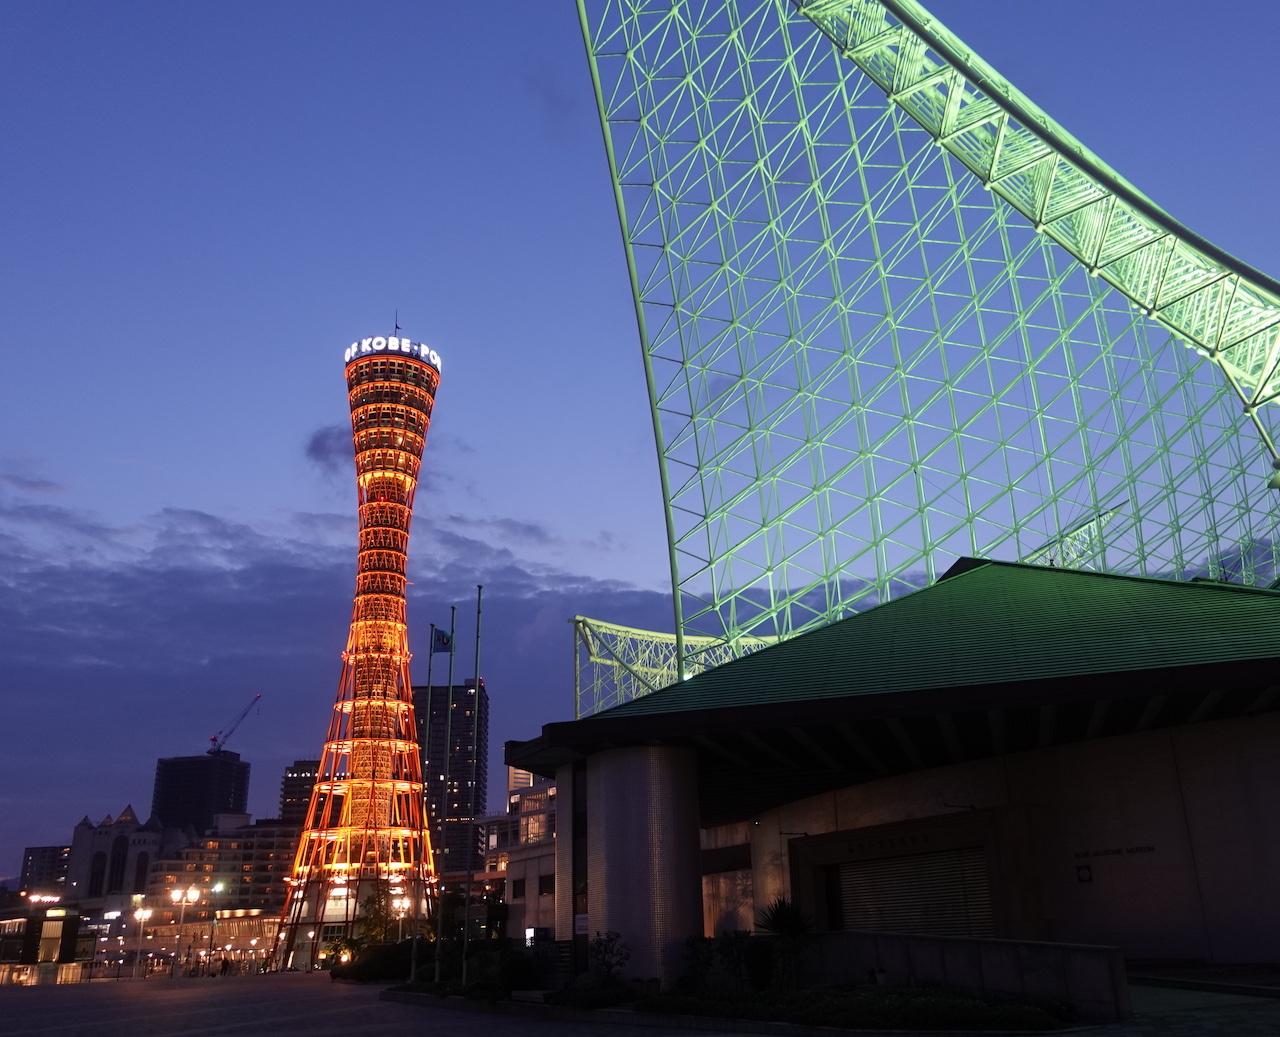 JANOG44@神戸出張 2日目。天孫降臨でラーメン食べて神戸ポートタワーに登る!_b0024832_23160424.jpg